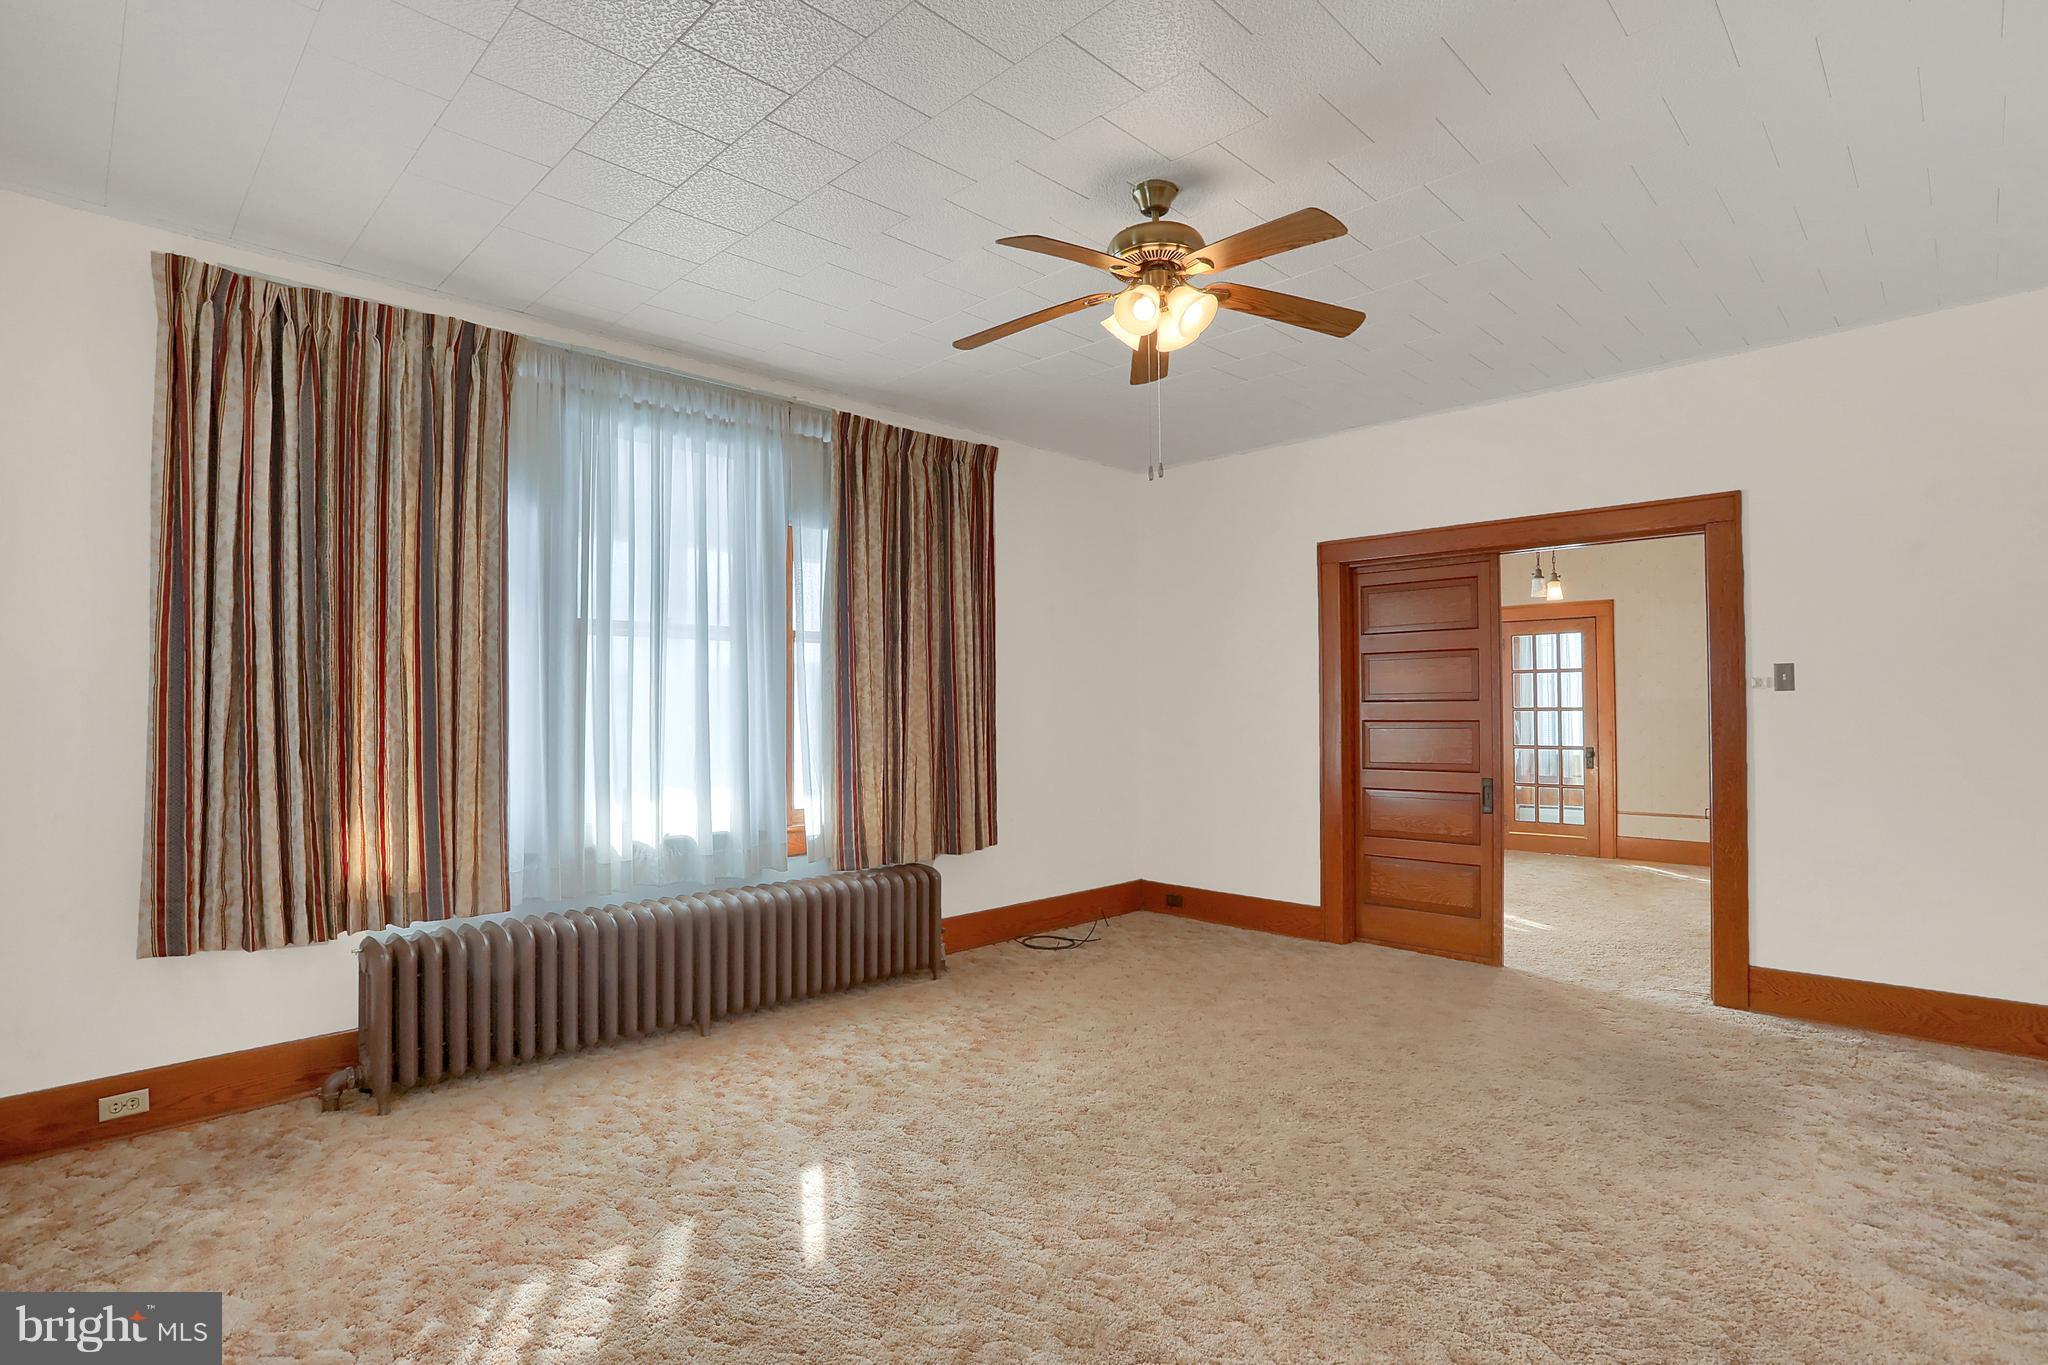 390 Kline Rd, Friedens, PA 15541